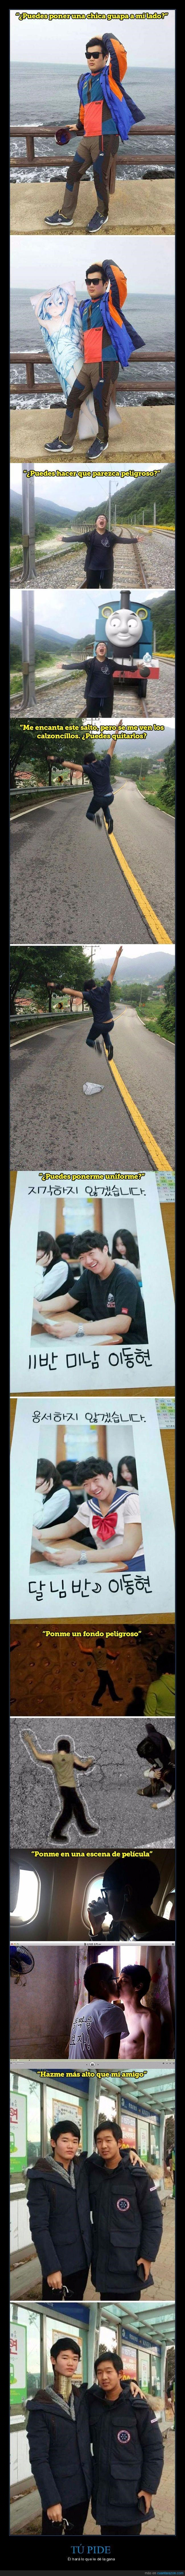 lista de fotos de trolleo photoshop coreano